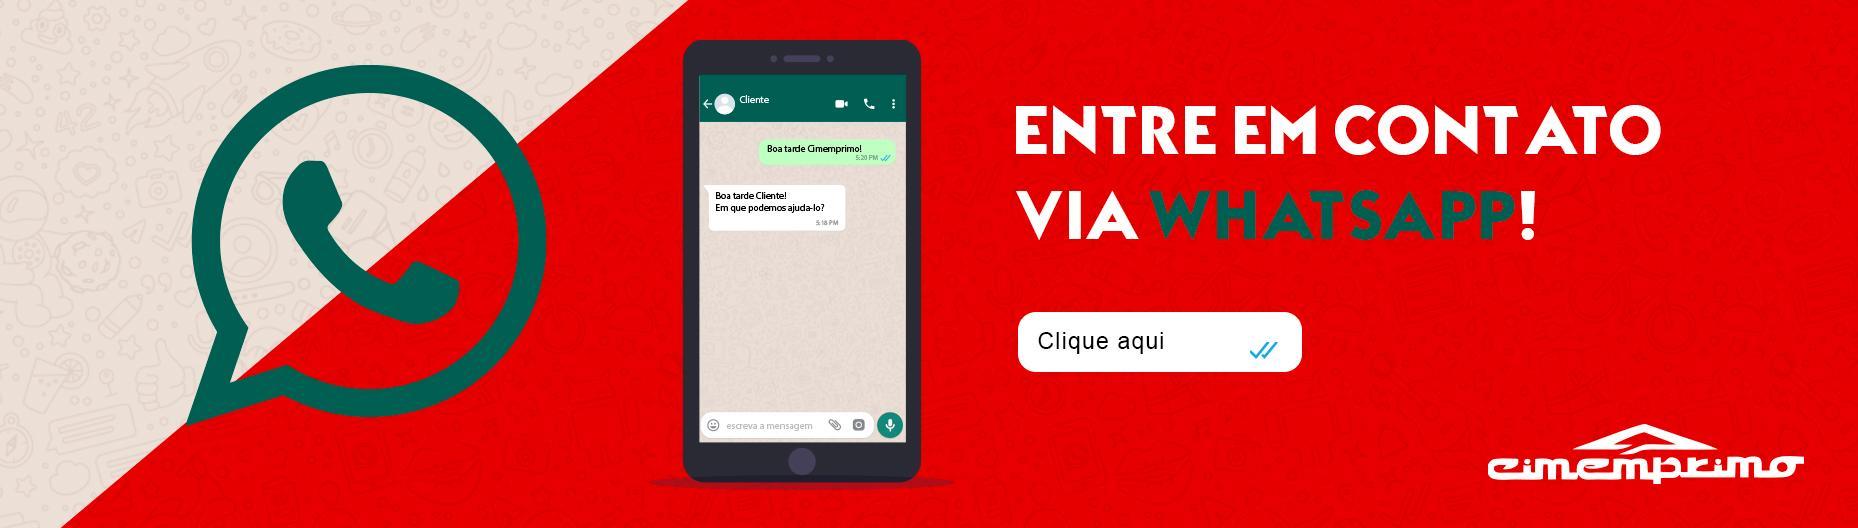 Chame-nos no Whatsapp